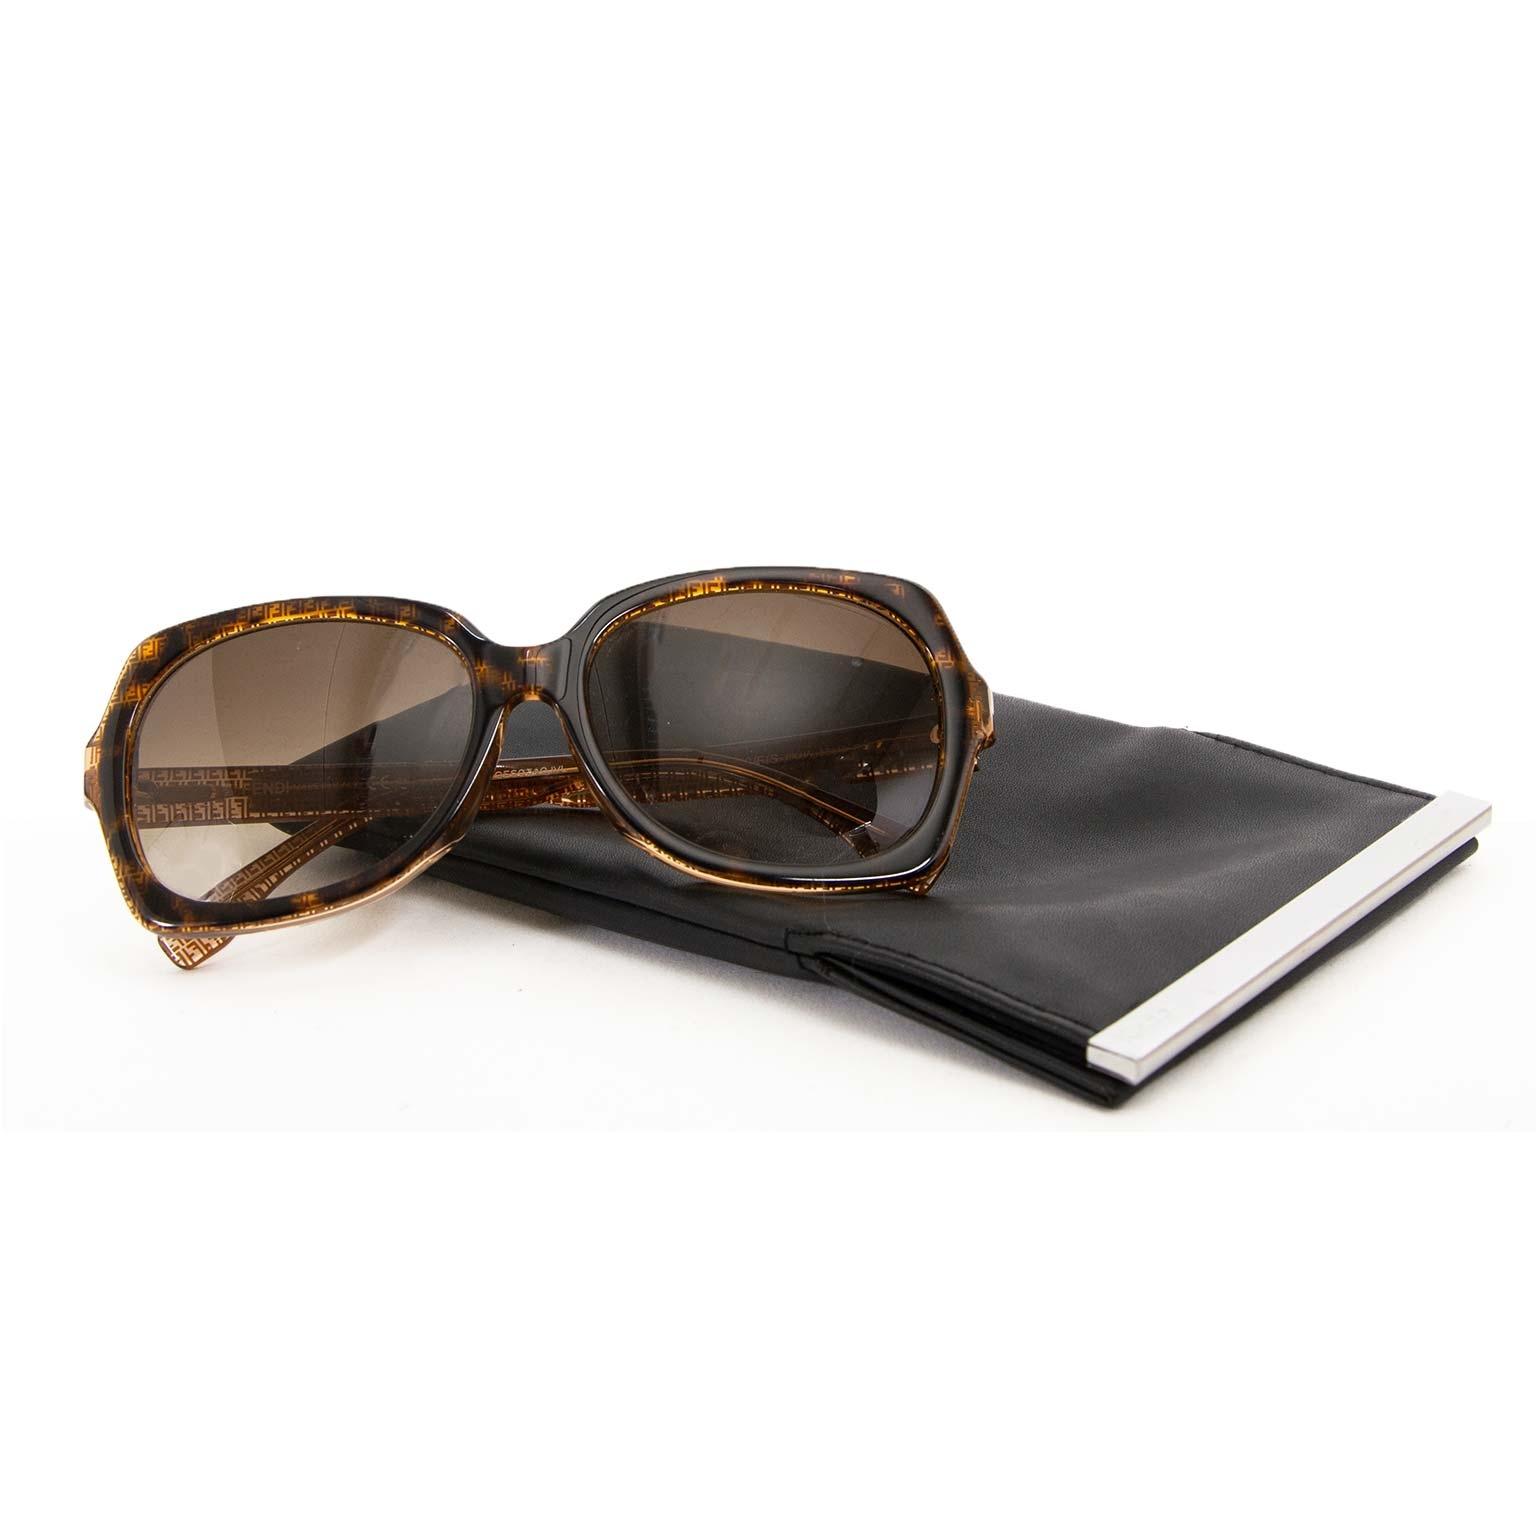 fendi monogram rectangle sunglasses now for sale at labellov vintage fashion webshop belgium